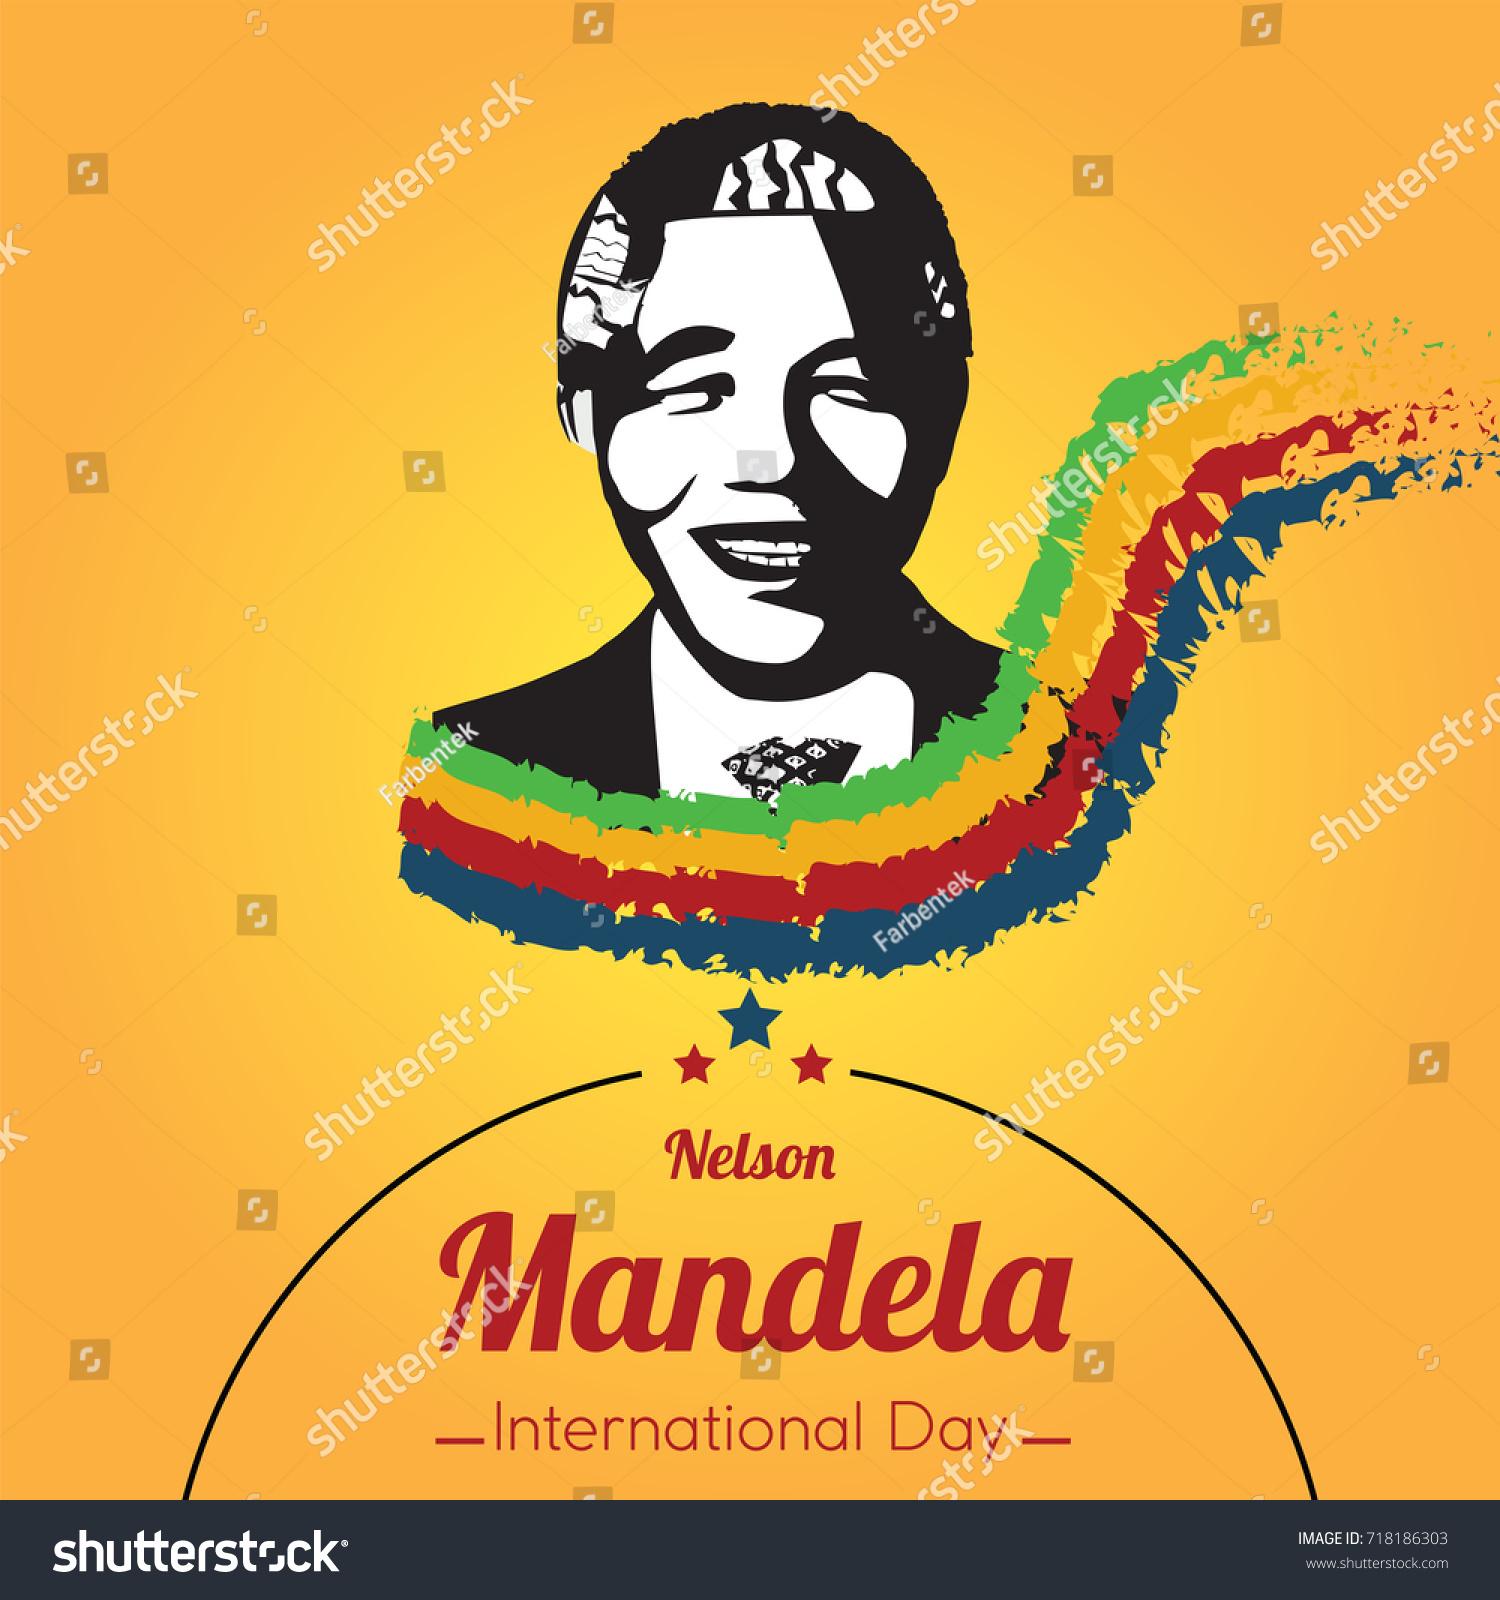 Nelson mandela international day 18 july mandela portrait silhouette conceptual illustration vector